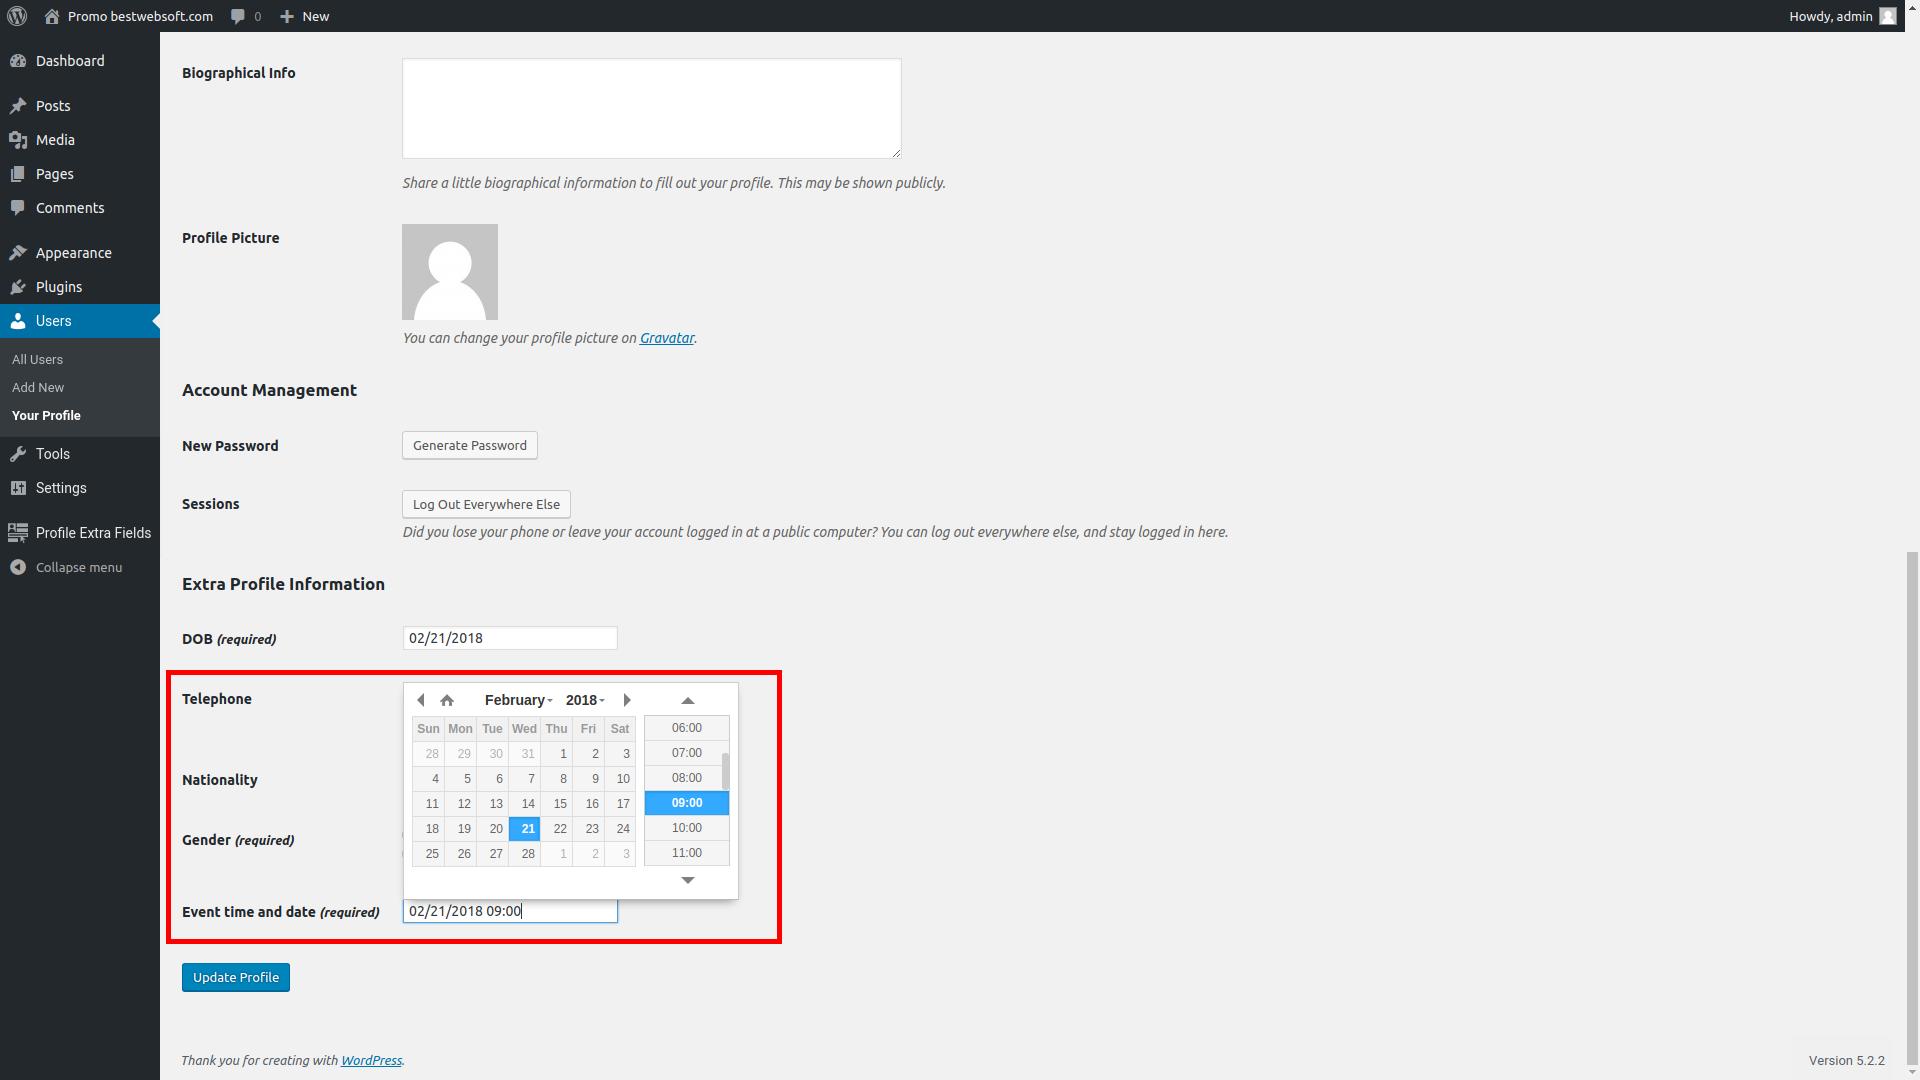 profile extra fields screenshot 10